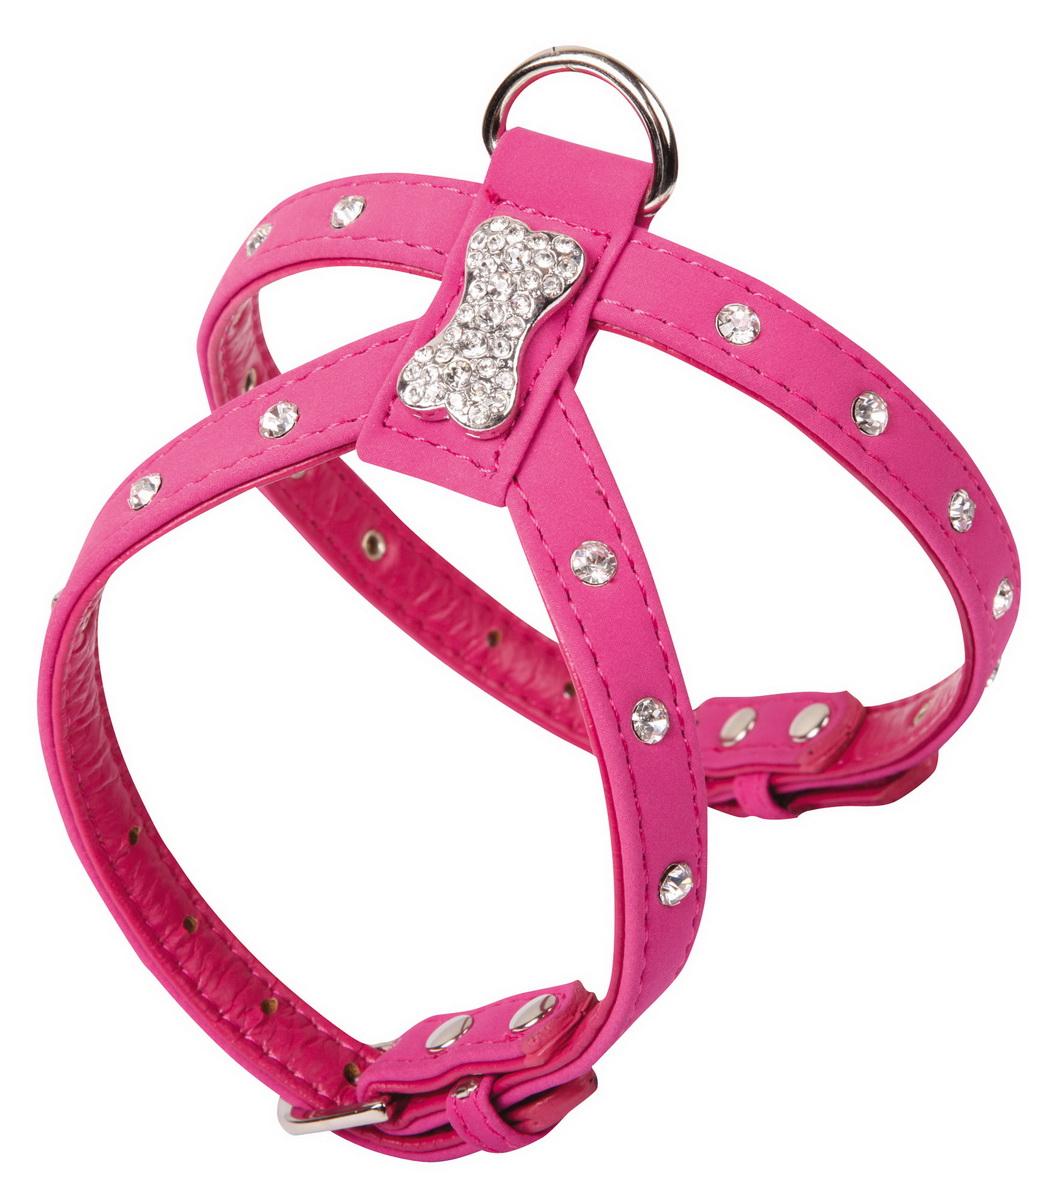 Шлейка для собак Dezzie, цвет: розовый, обхват шеи 22-28 см, обхват груди 34-40 см. Размер L. 5624080 шлейка для собак dezzie цвет черный ширина 1 см обхват шеи 25 см обхват груди 28 33 см размер s 5624007